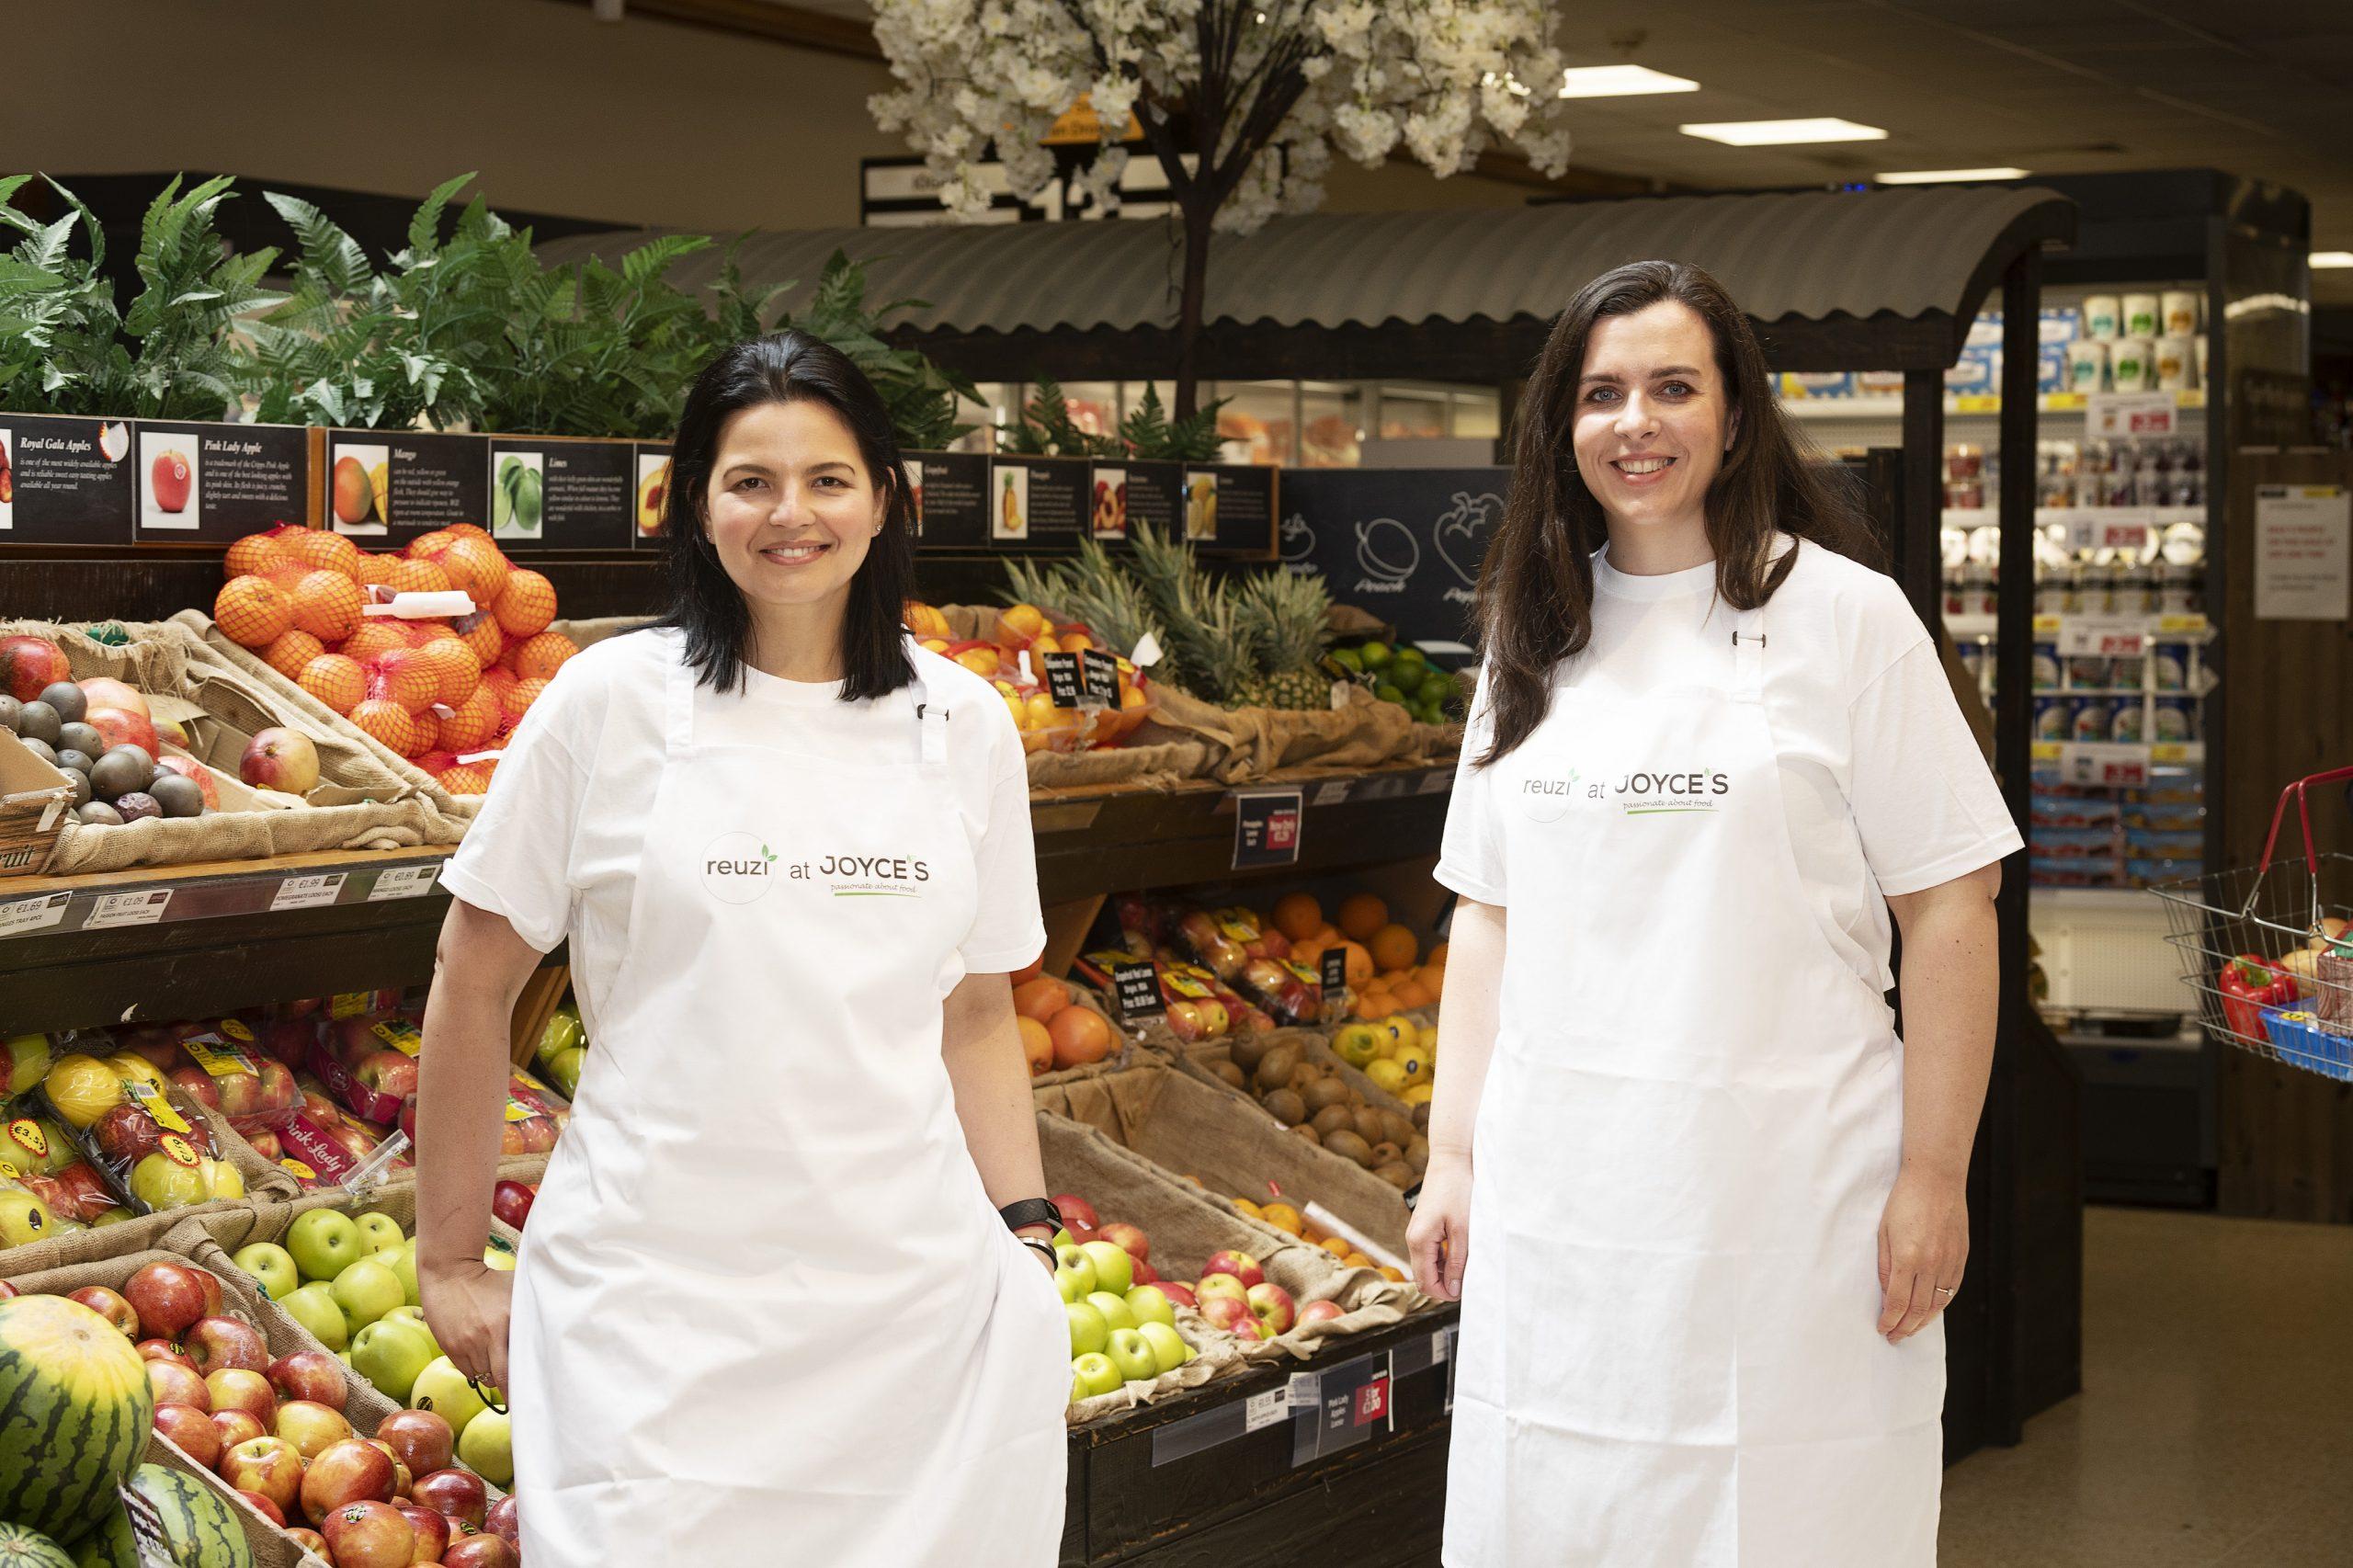 Joyce's Supermarkets partners with minimal waste store reuzi